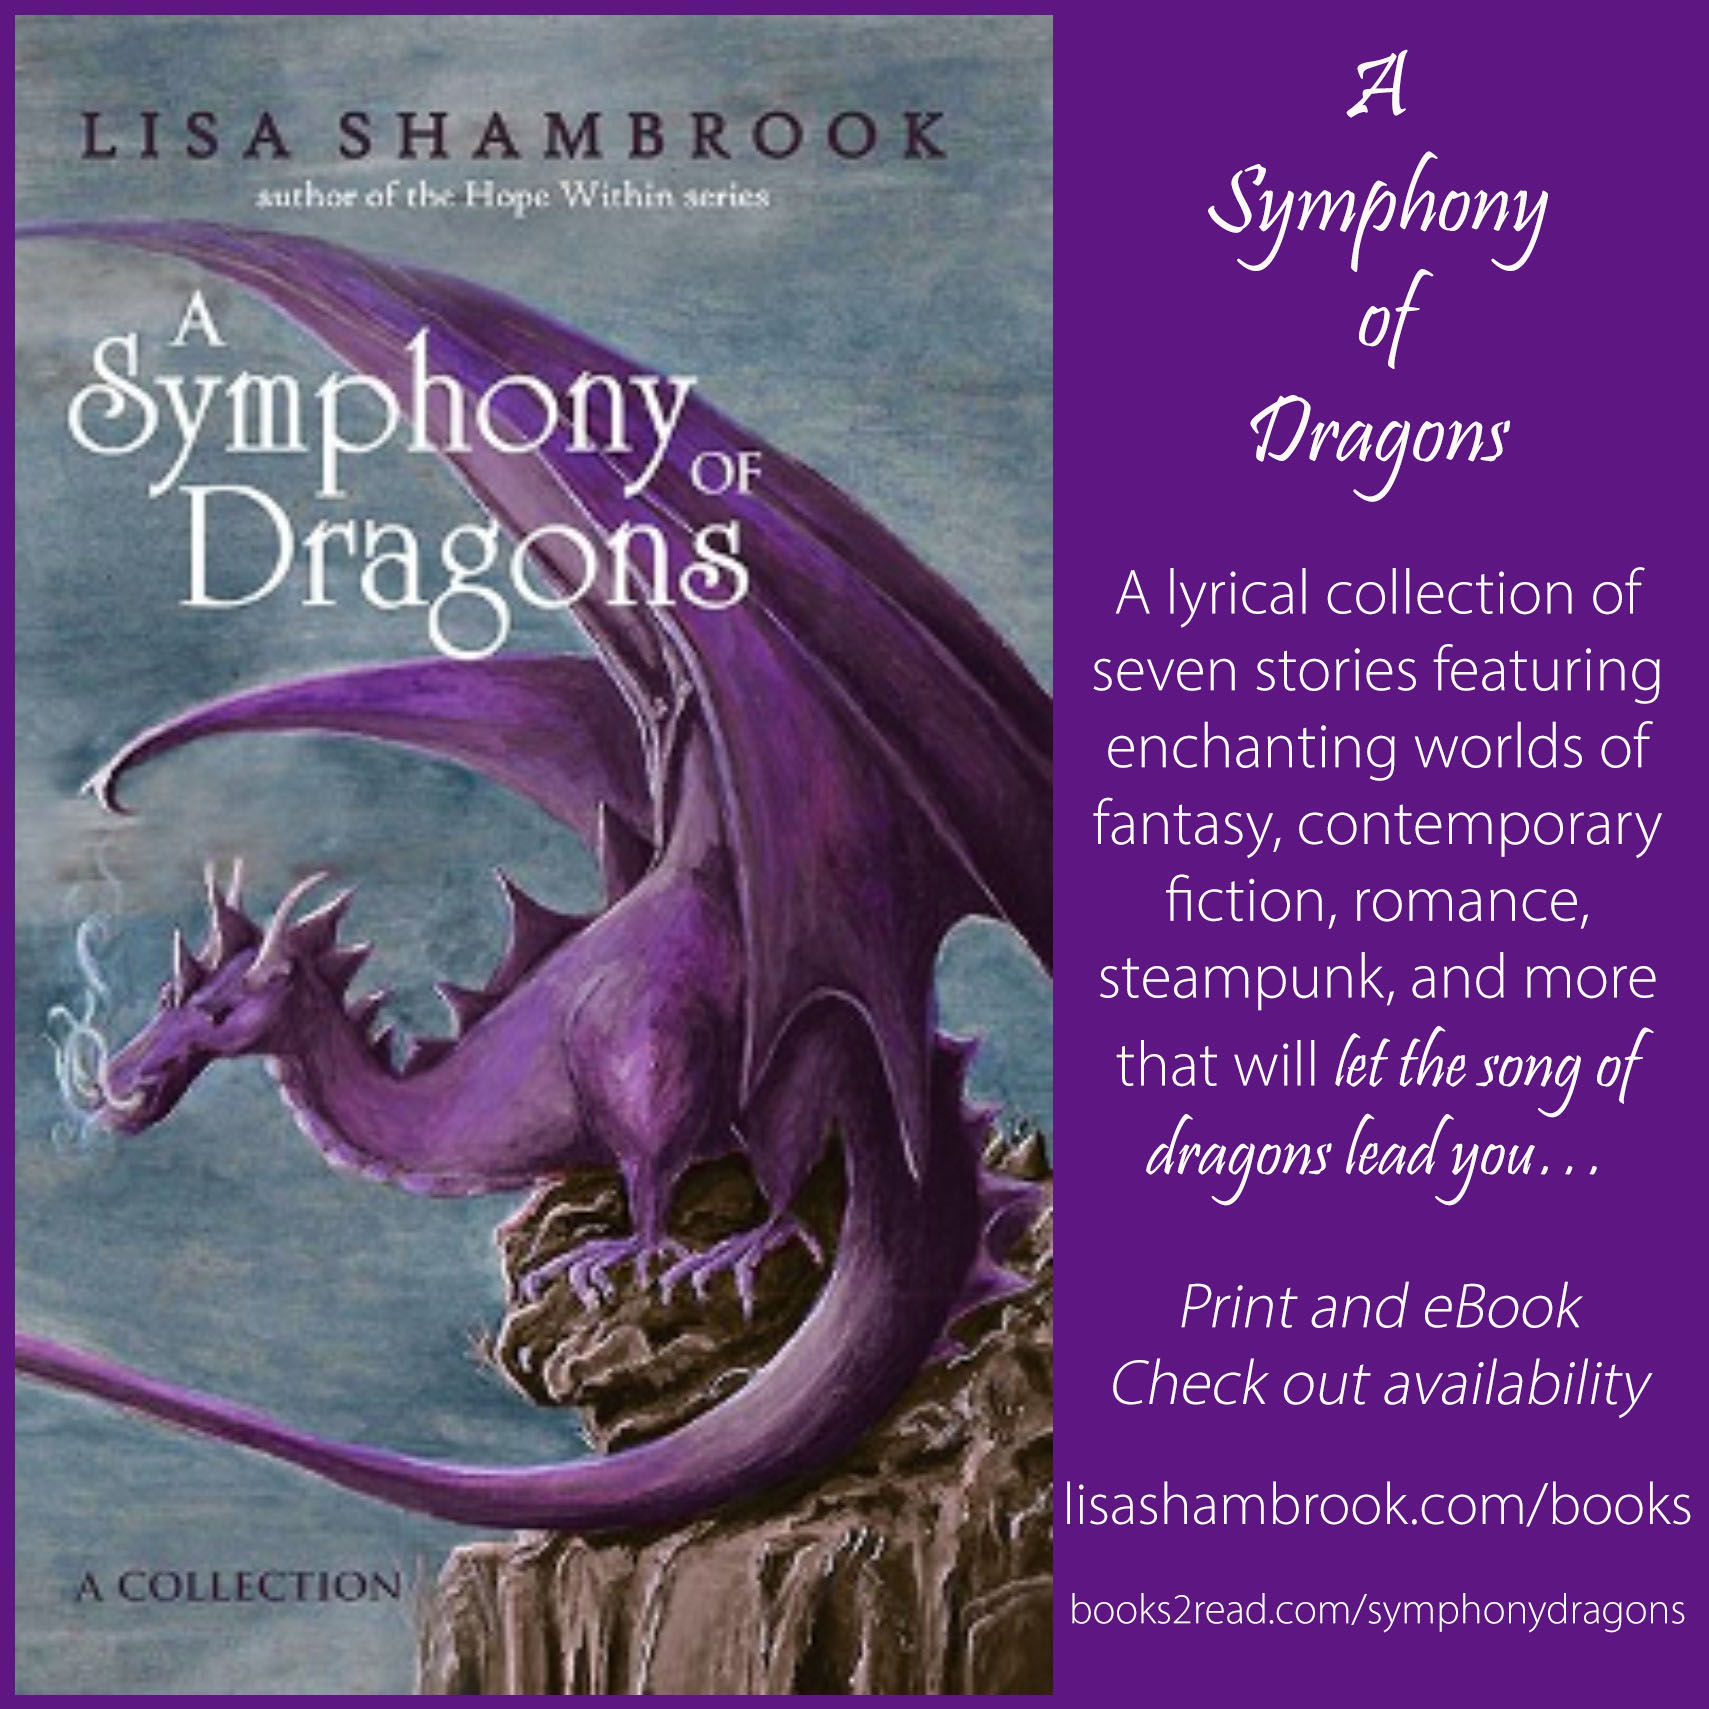 A Symphony of Dragons - Lisa Shambrook - Purple Ad lower